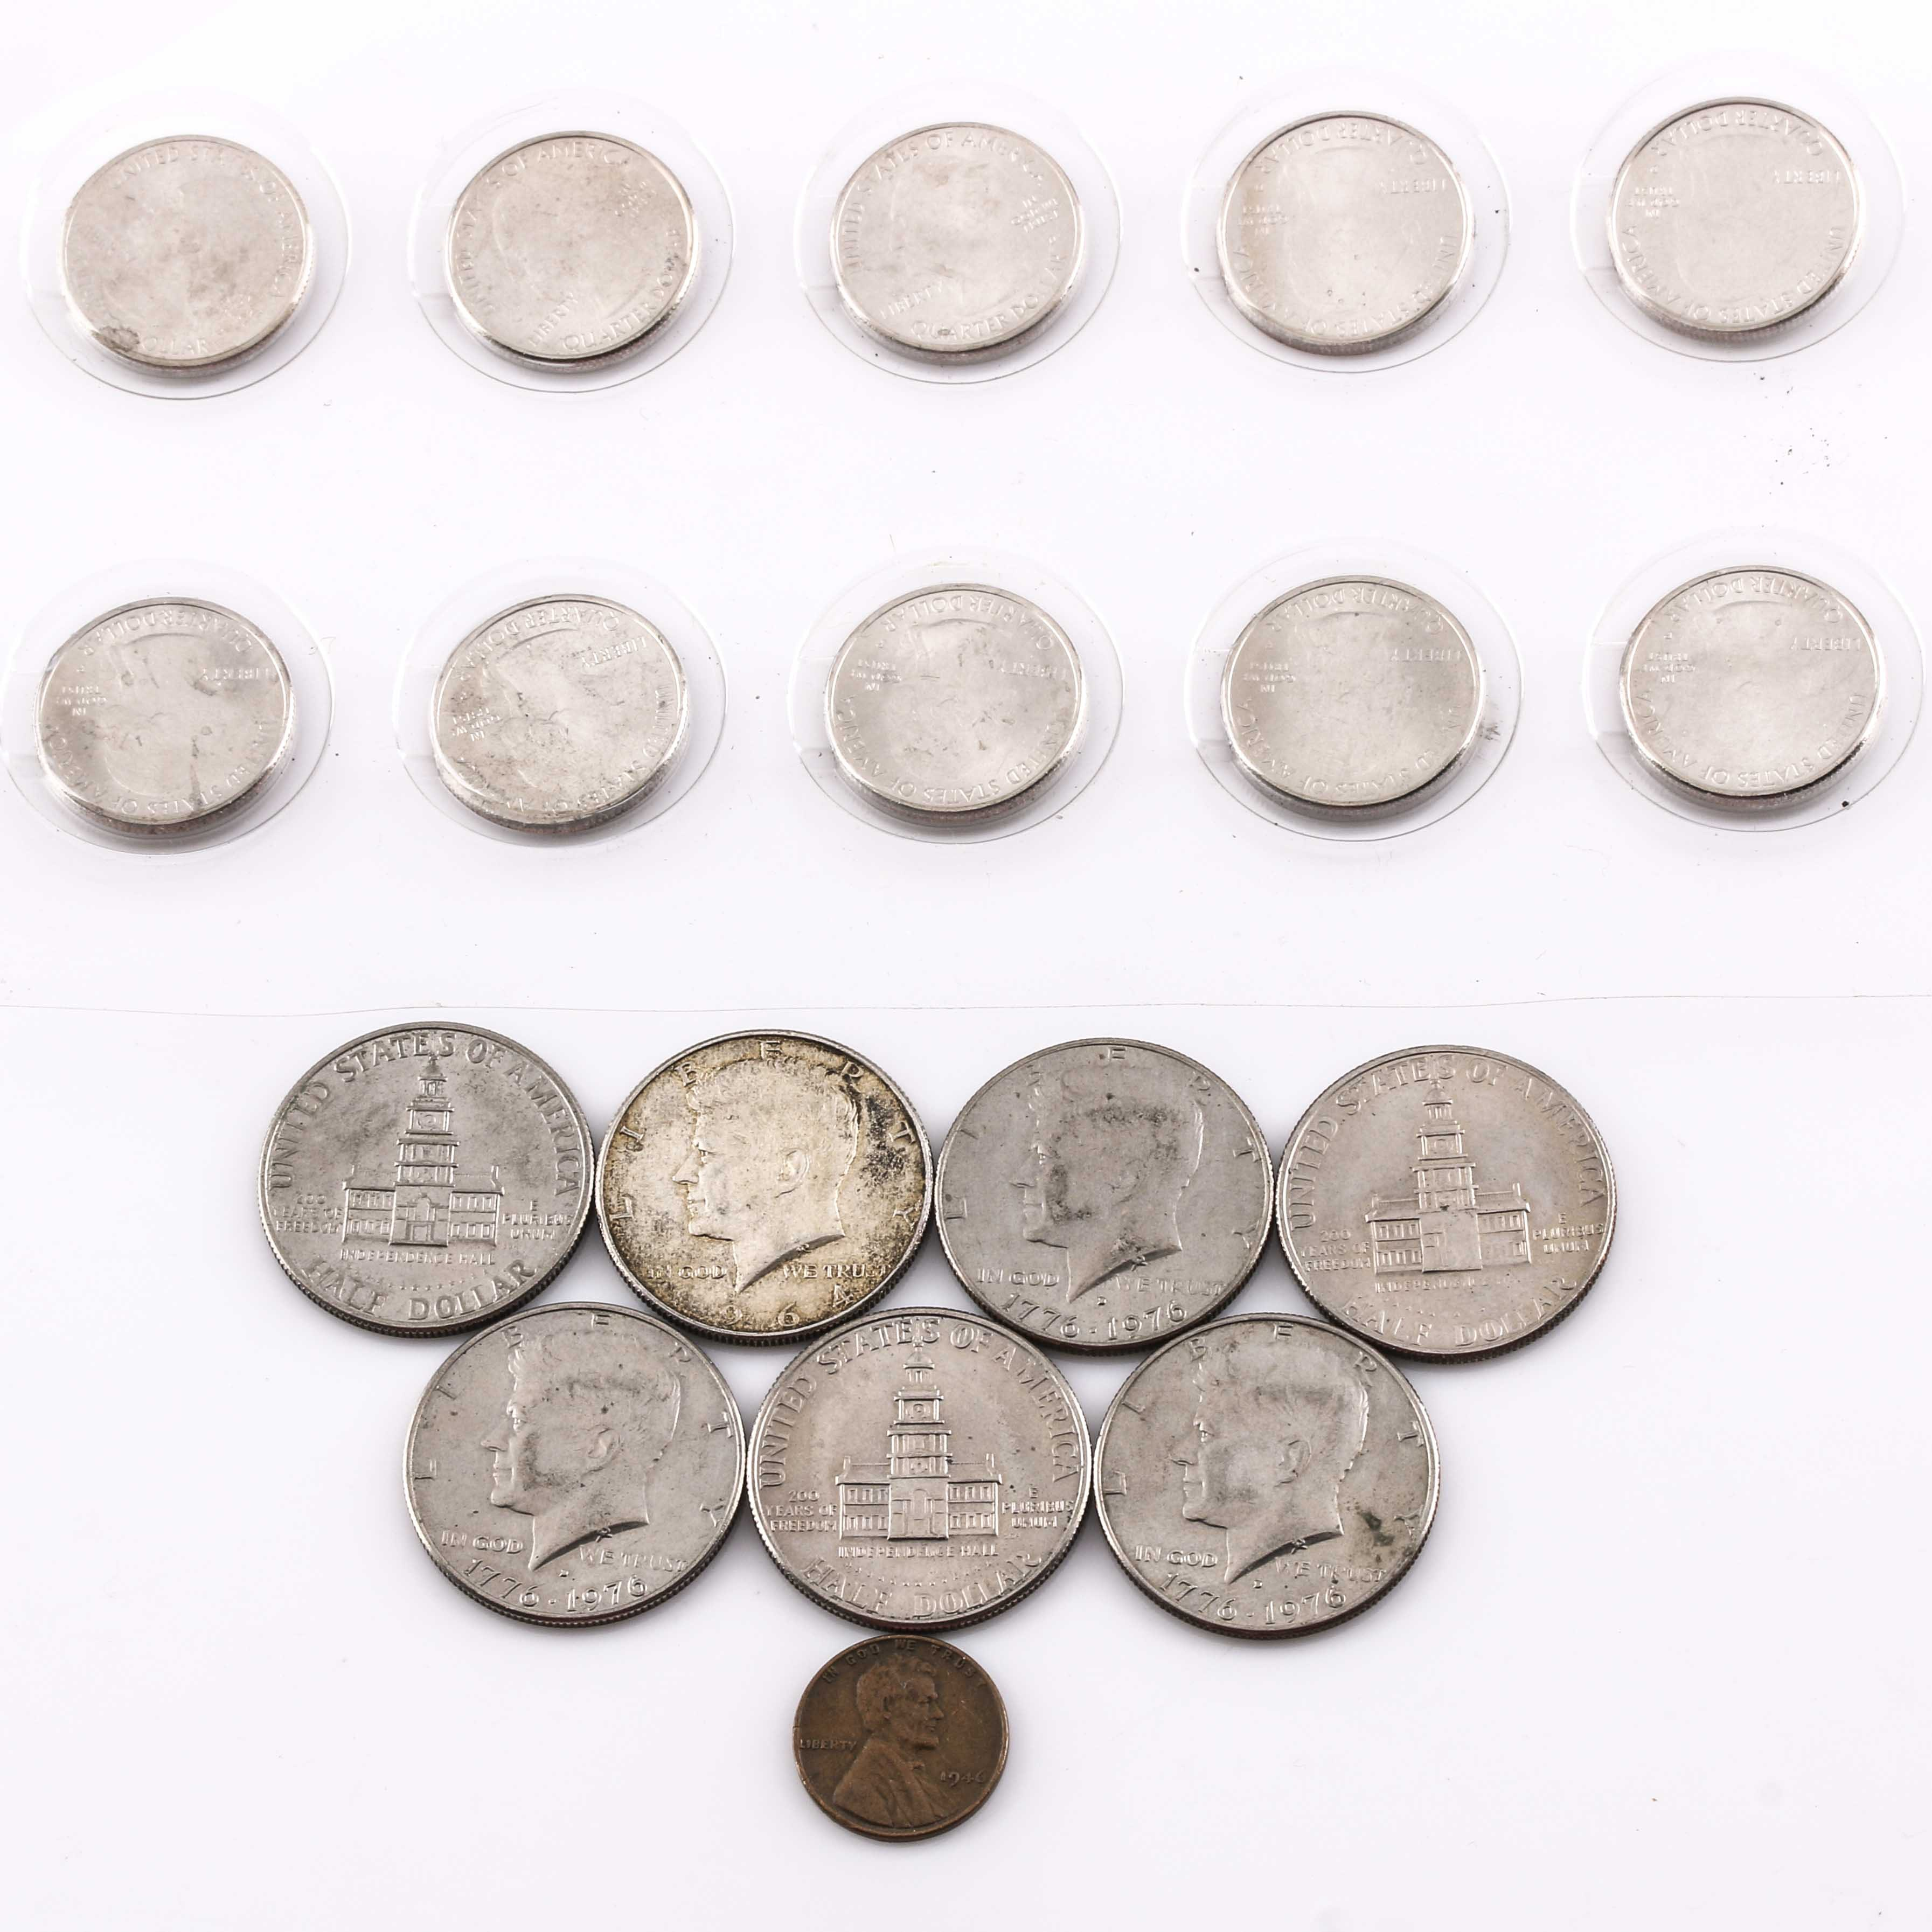 Assortment of U.S. Coins